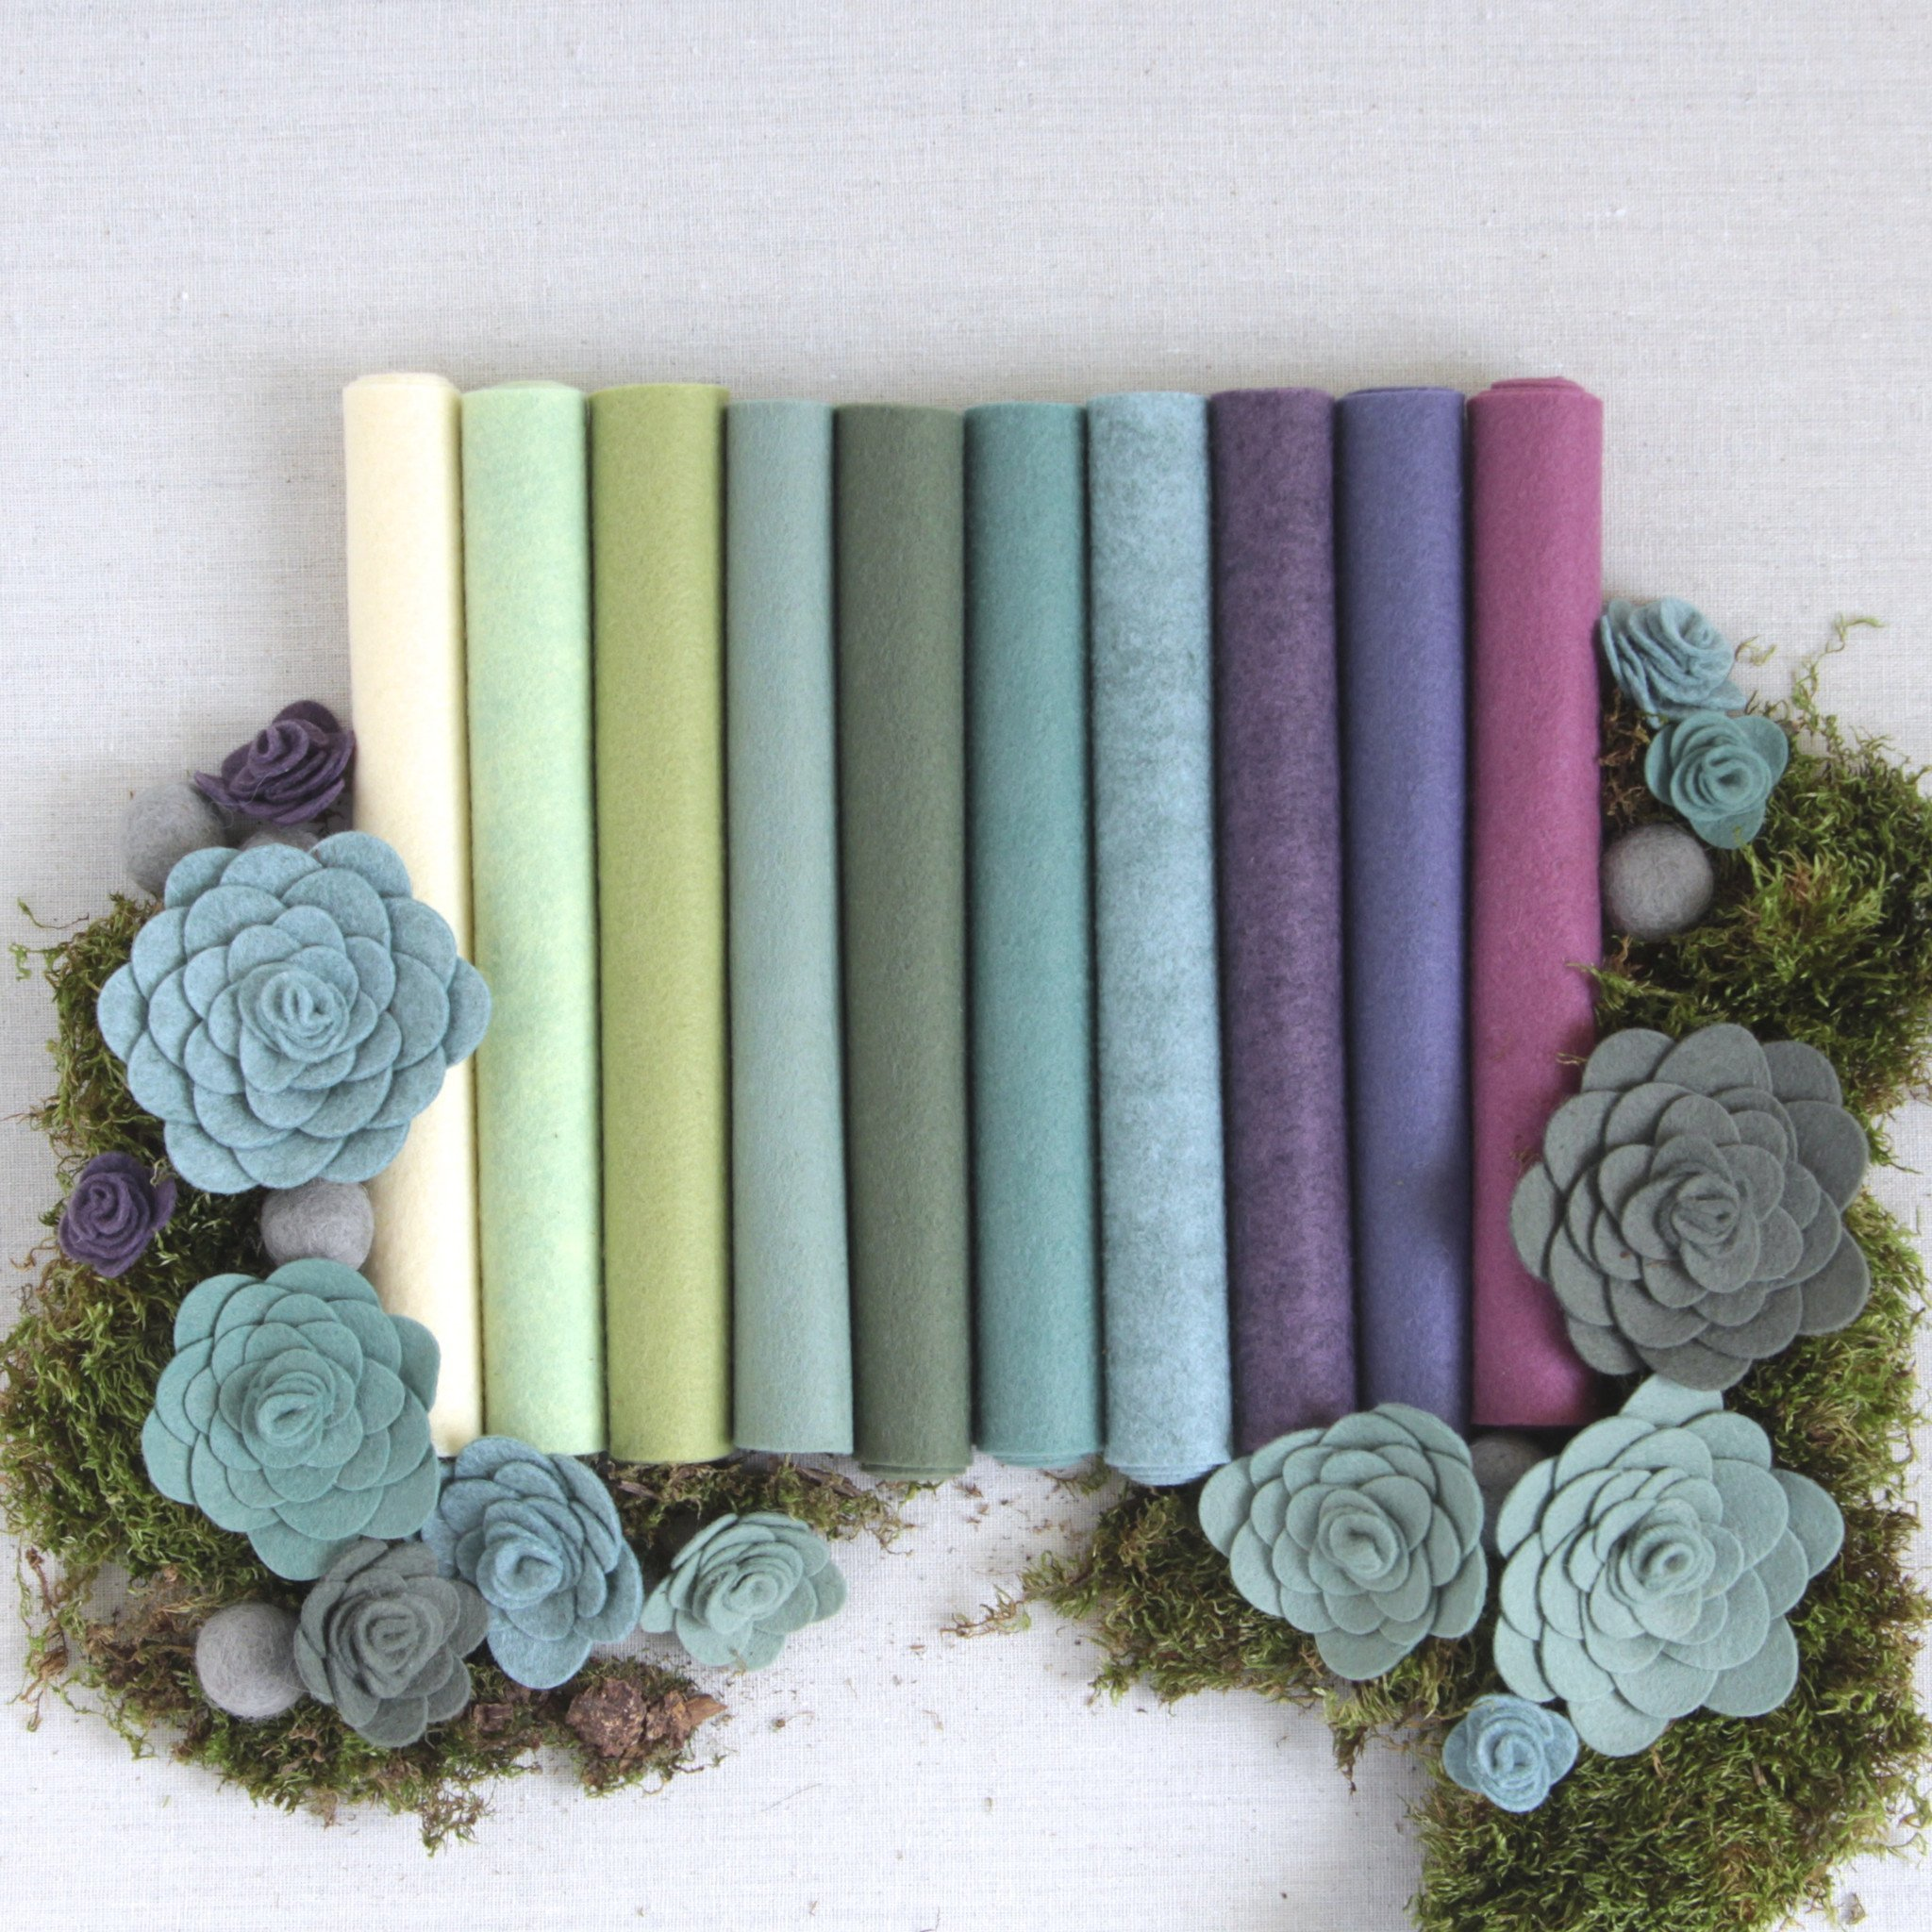 Wool Felt, Succulent Palette, 10 Sheets of Wool Blend Felt (10 12x18 inch Sheets) by Benzie Design (Image #1)